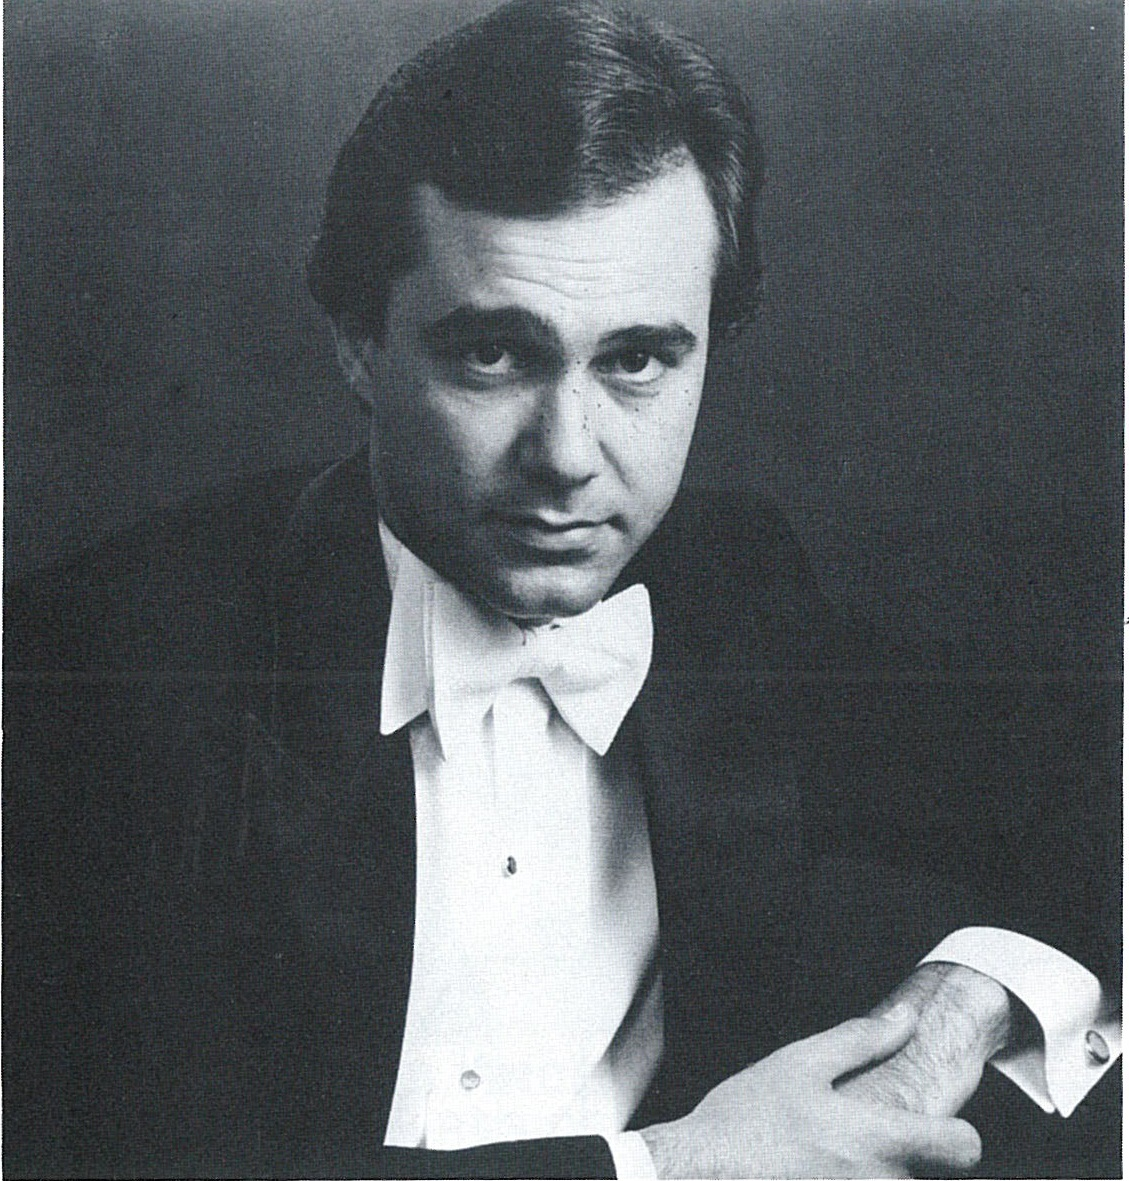 Headshot of Ermanno Florio